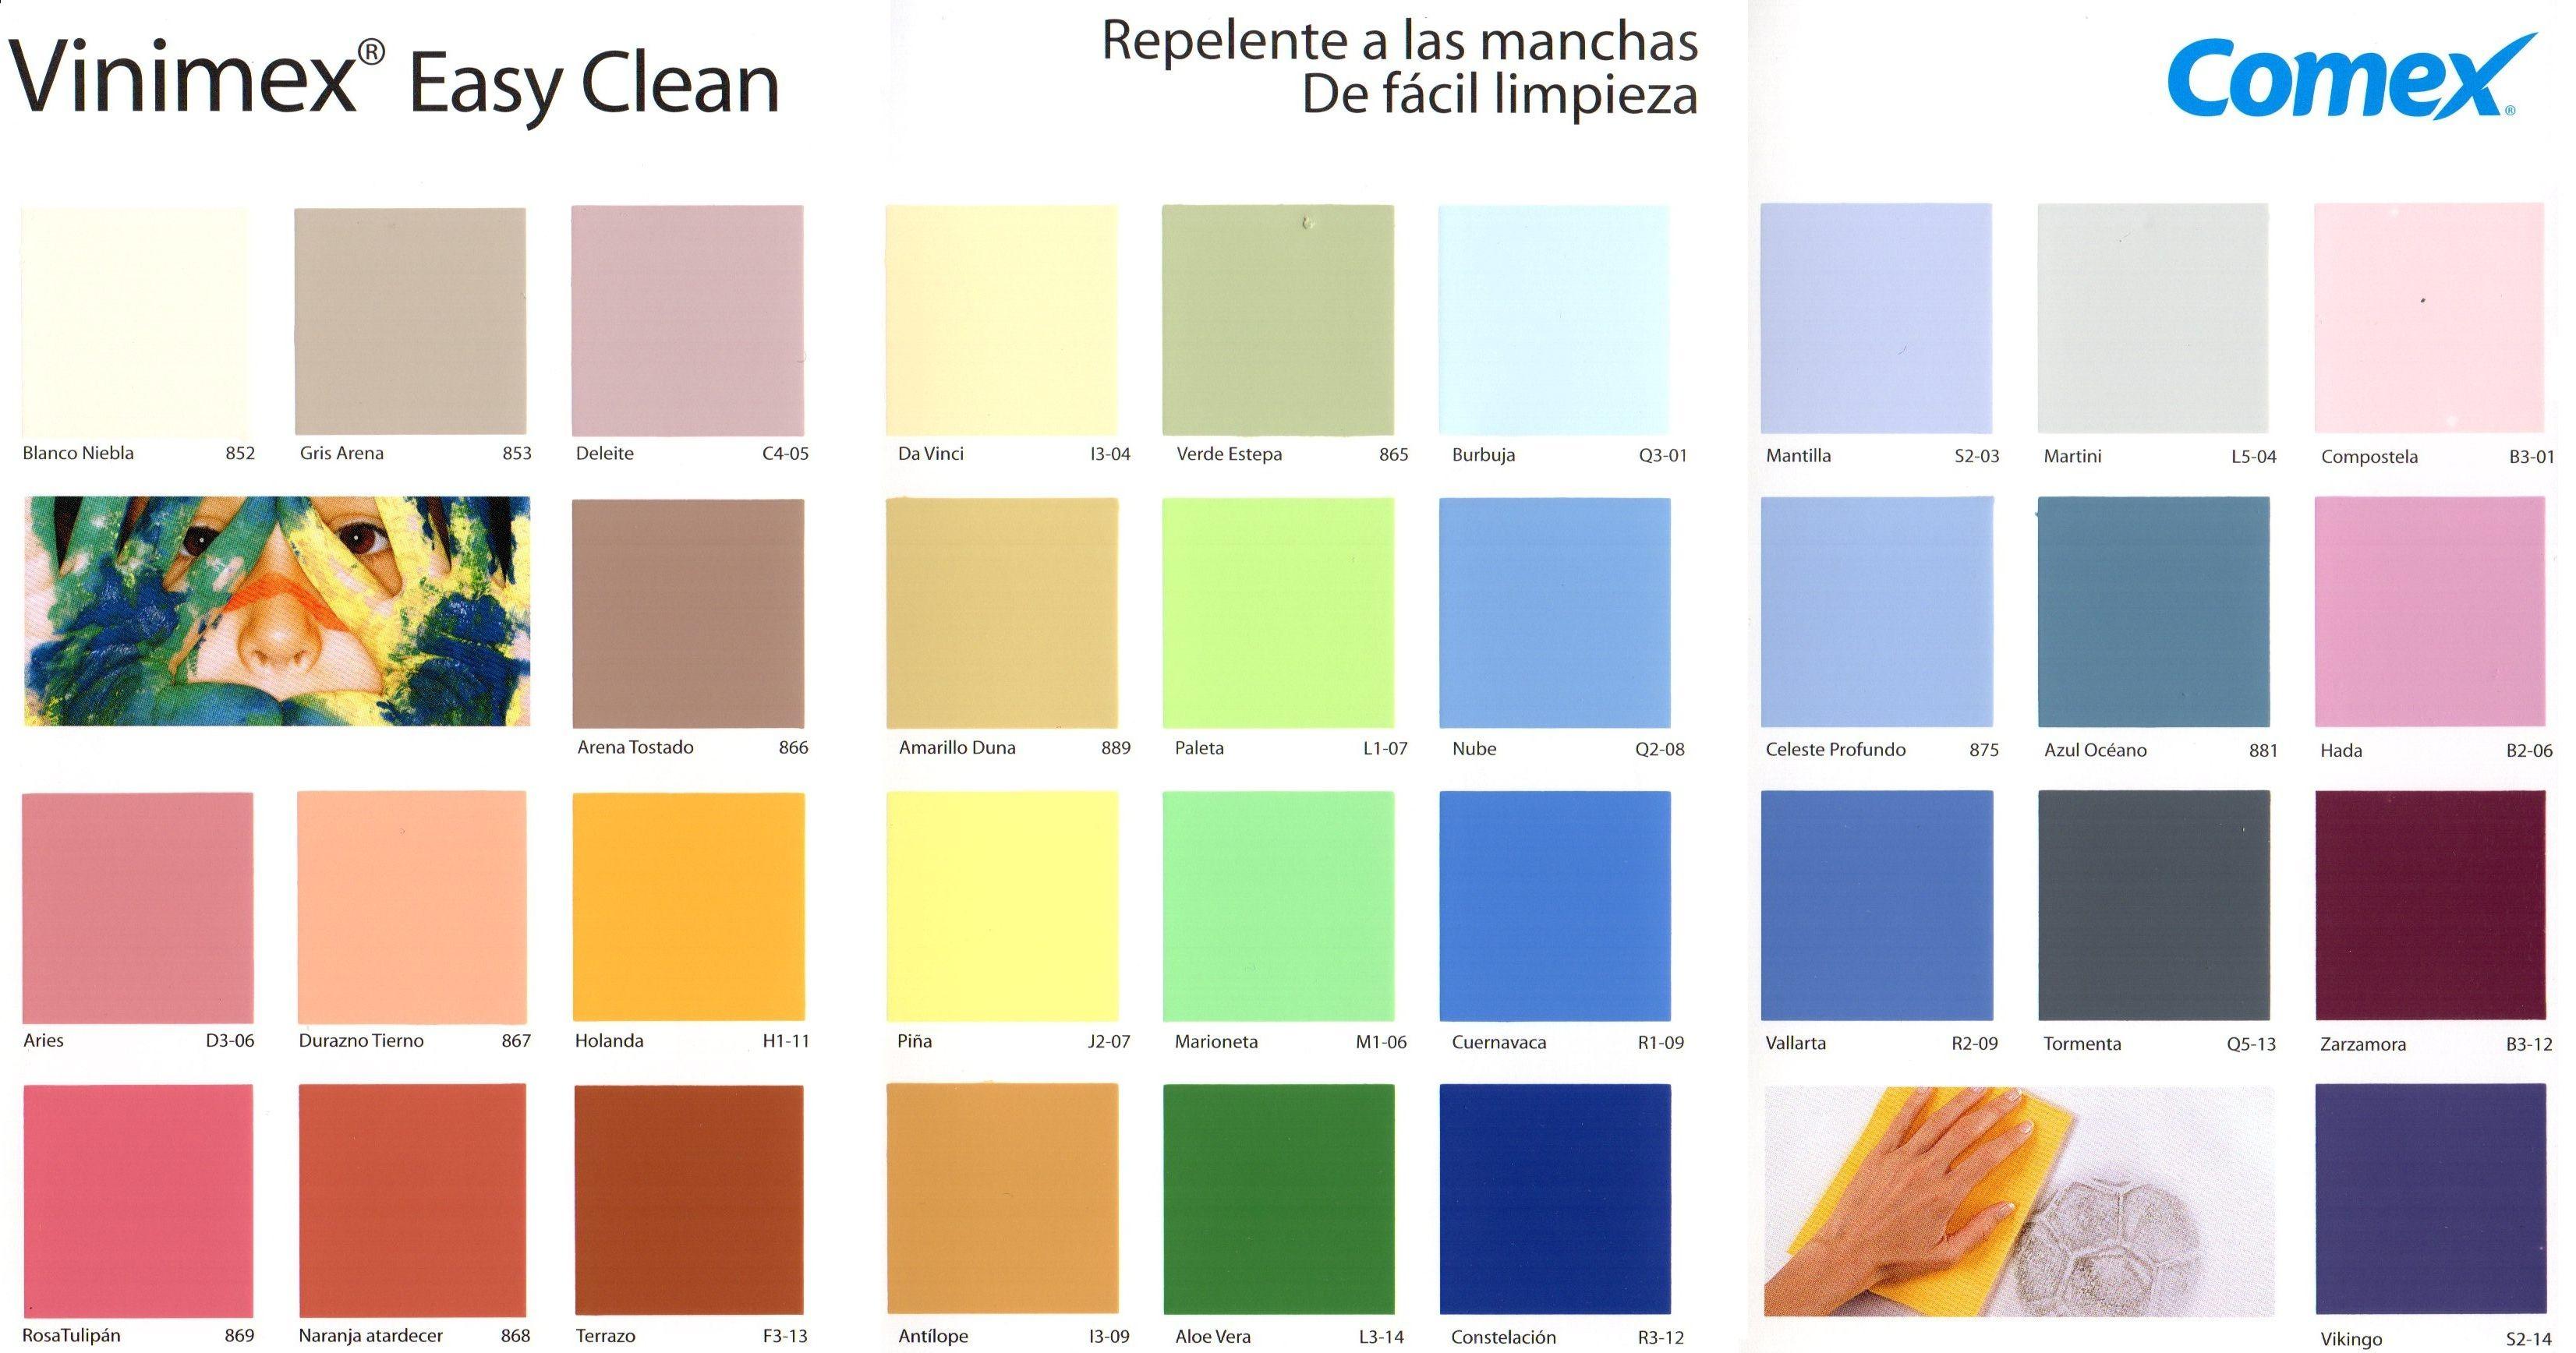 Vinimex Easy Clean COMEX 4L  colores  Colores de pintura Colores de comex y Catalogo de colores